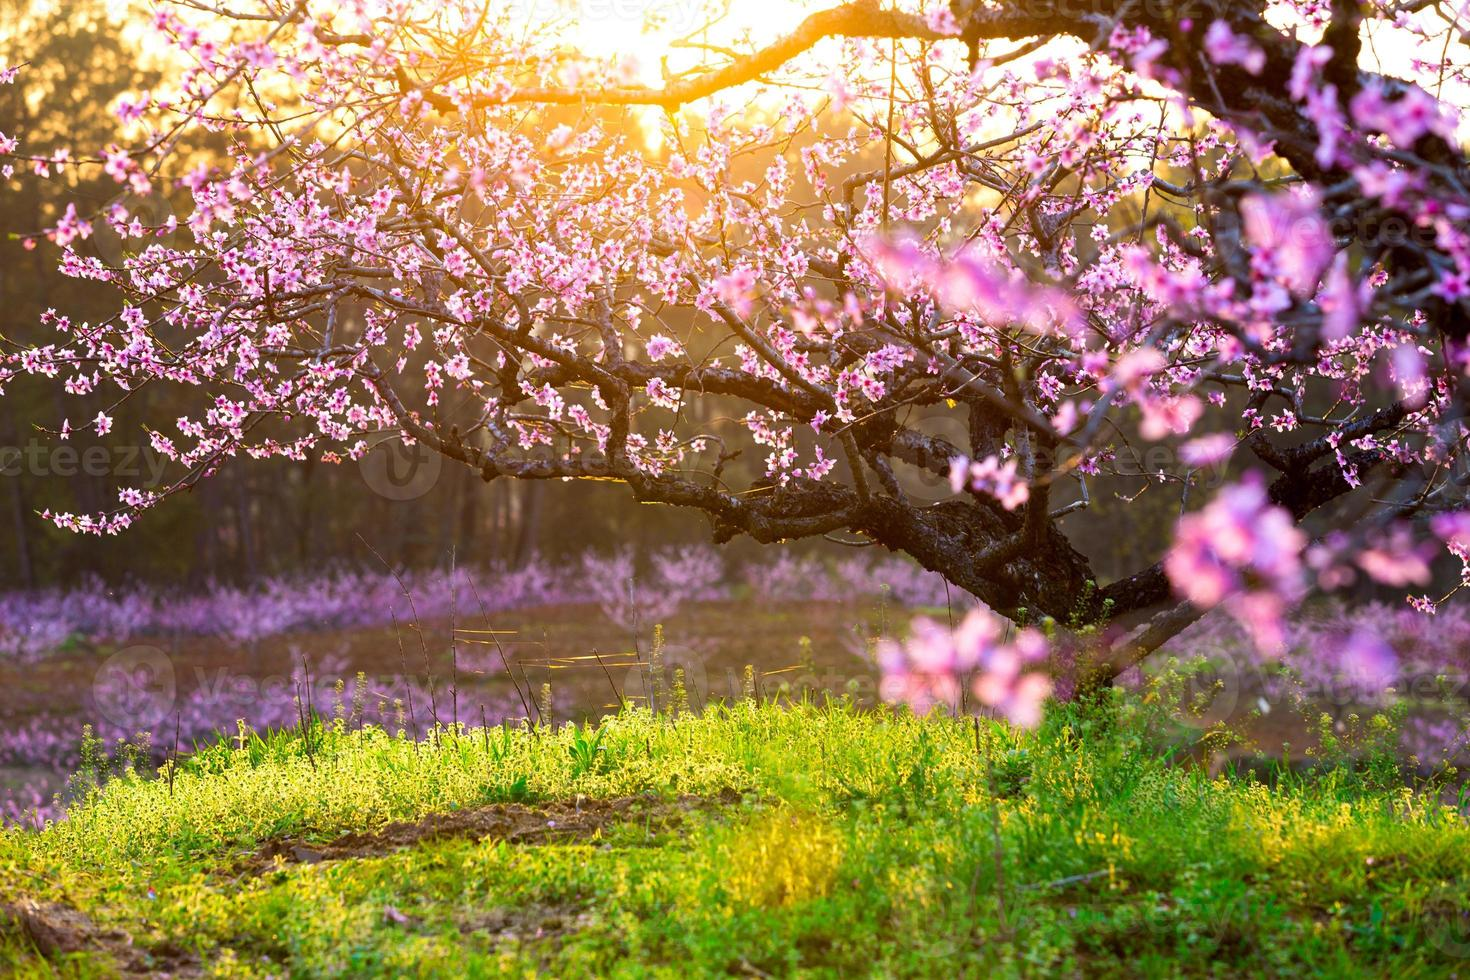 persikablomning, grönt gräs med solsken foto